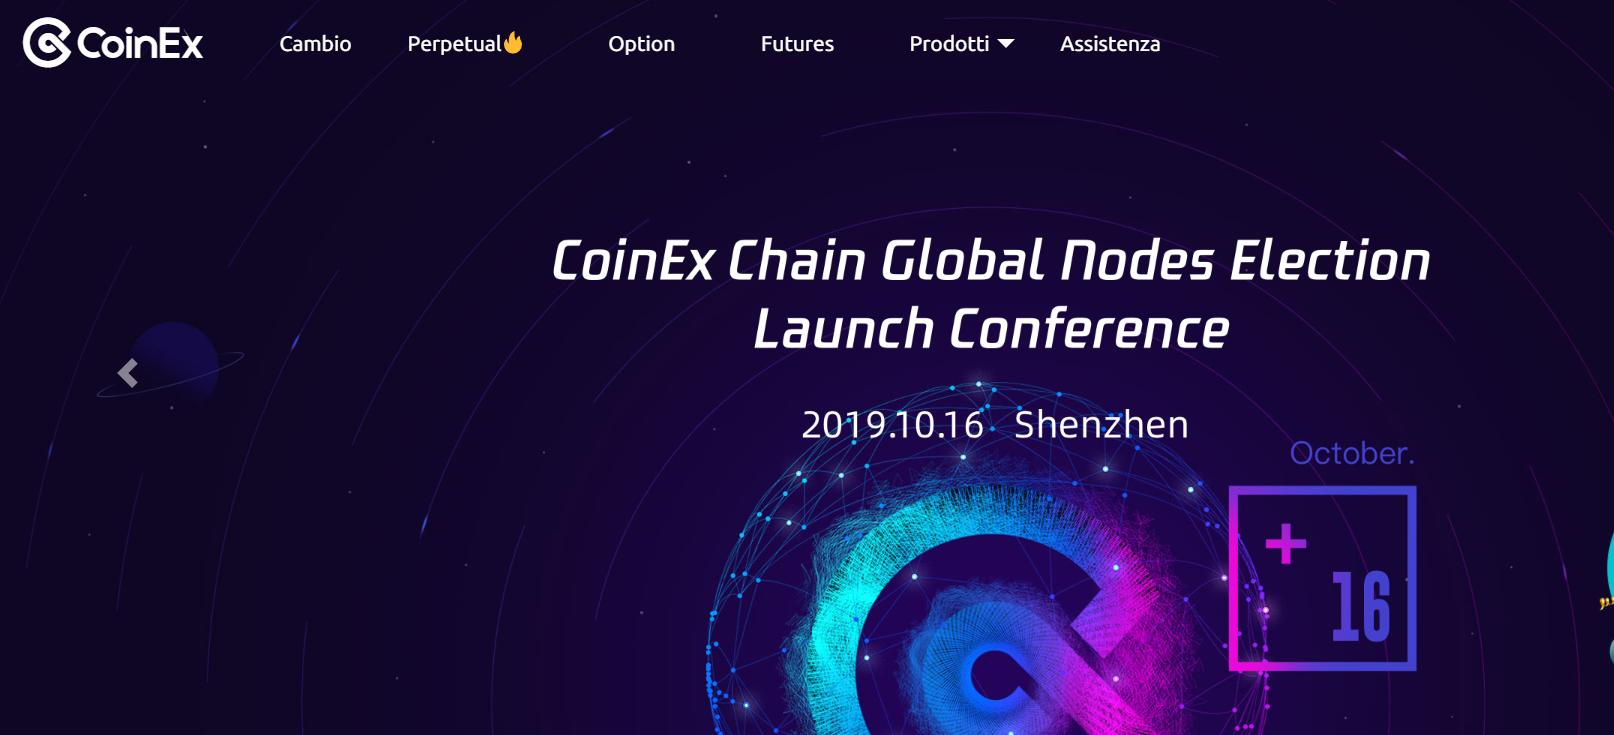 Coinex forex broker